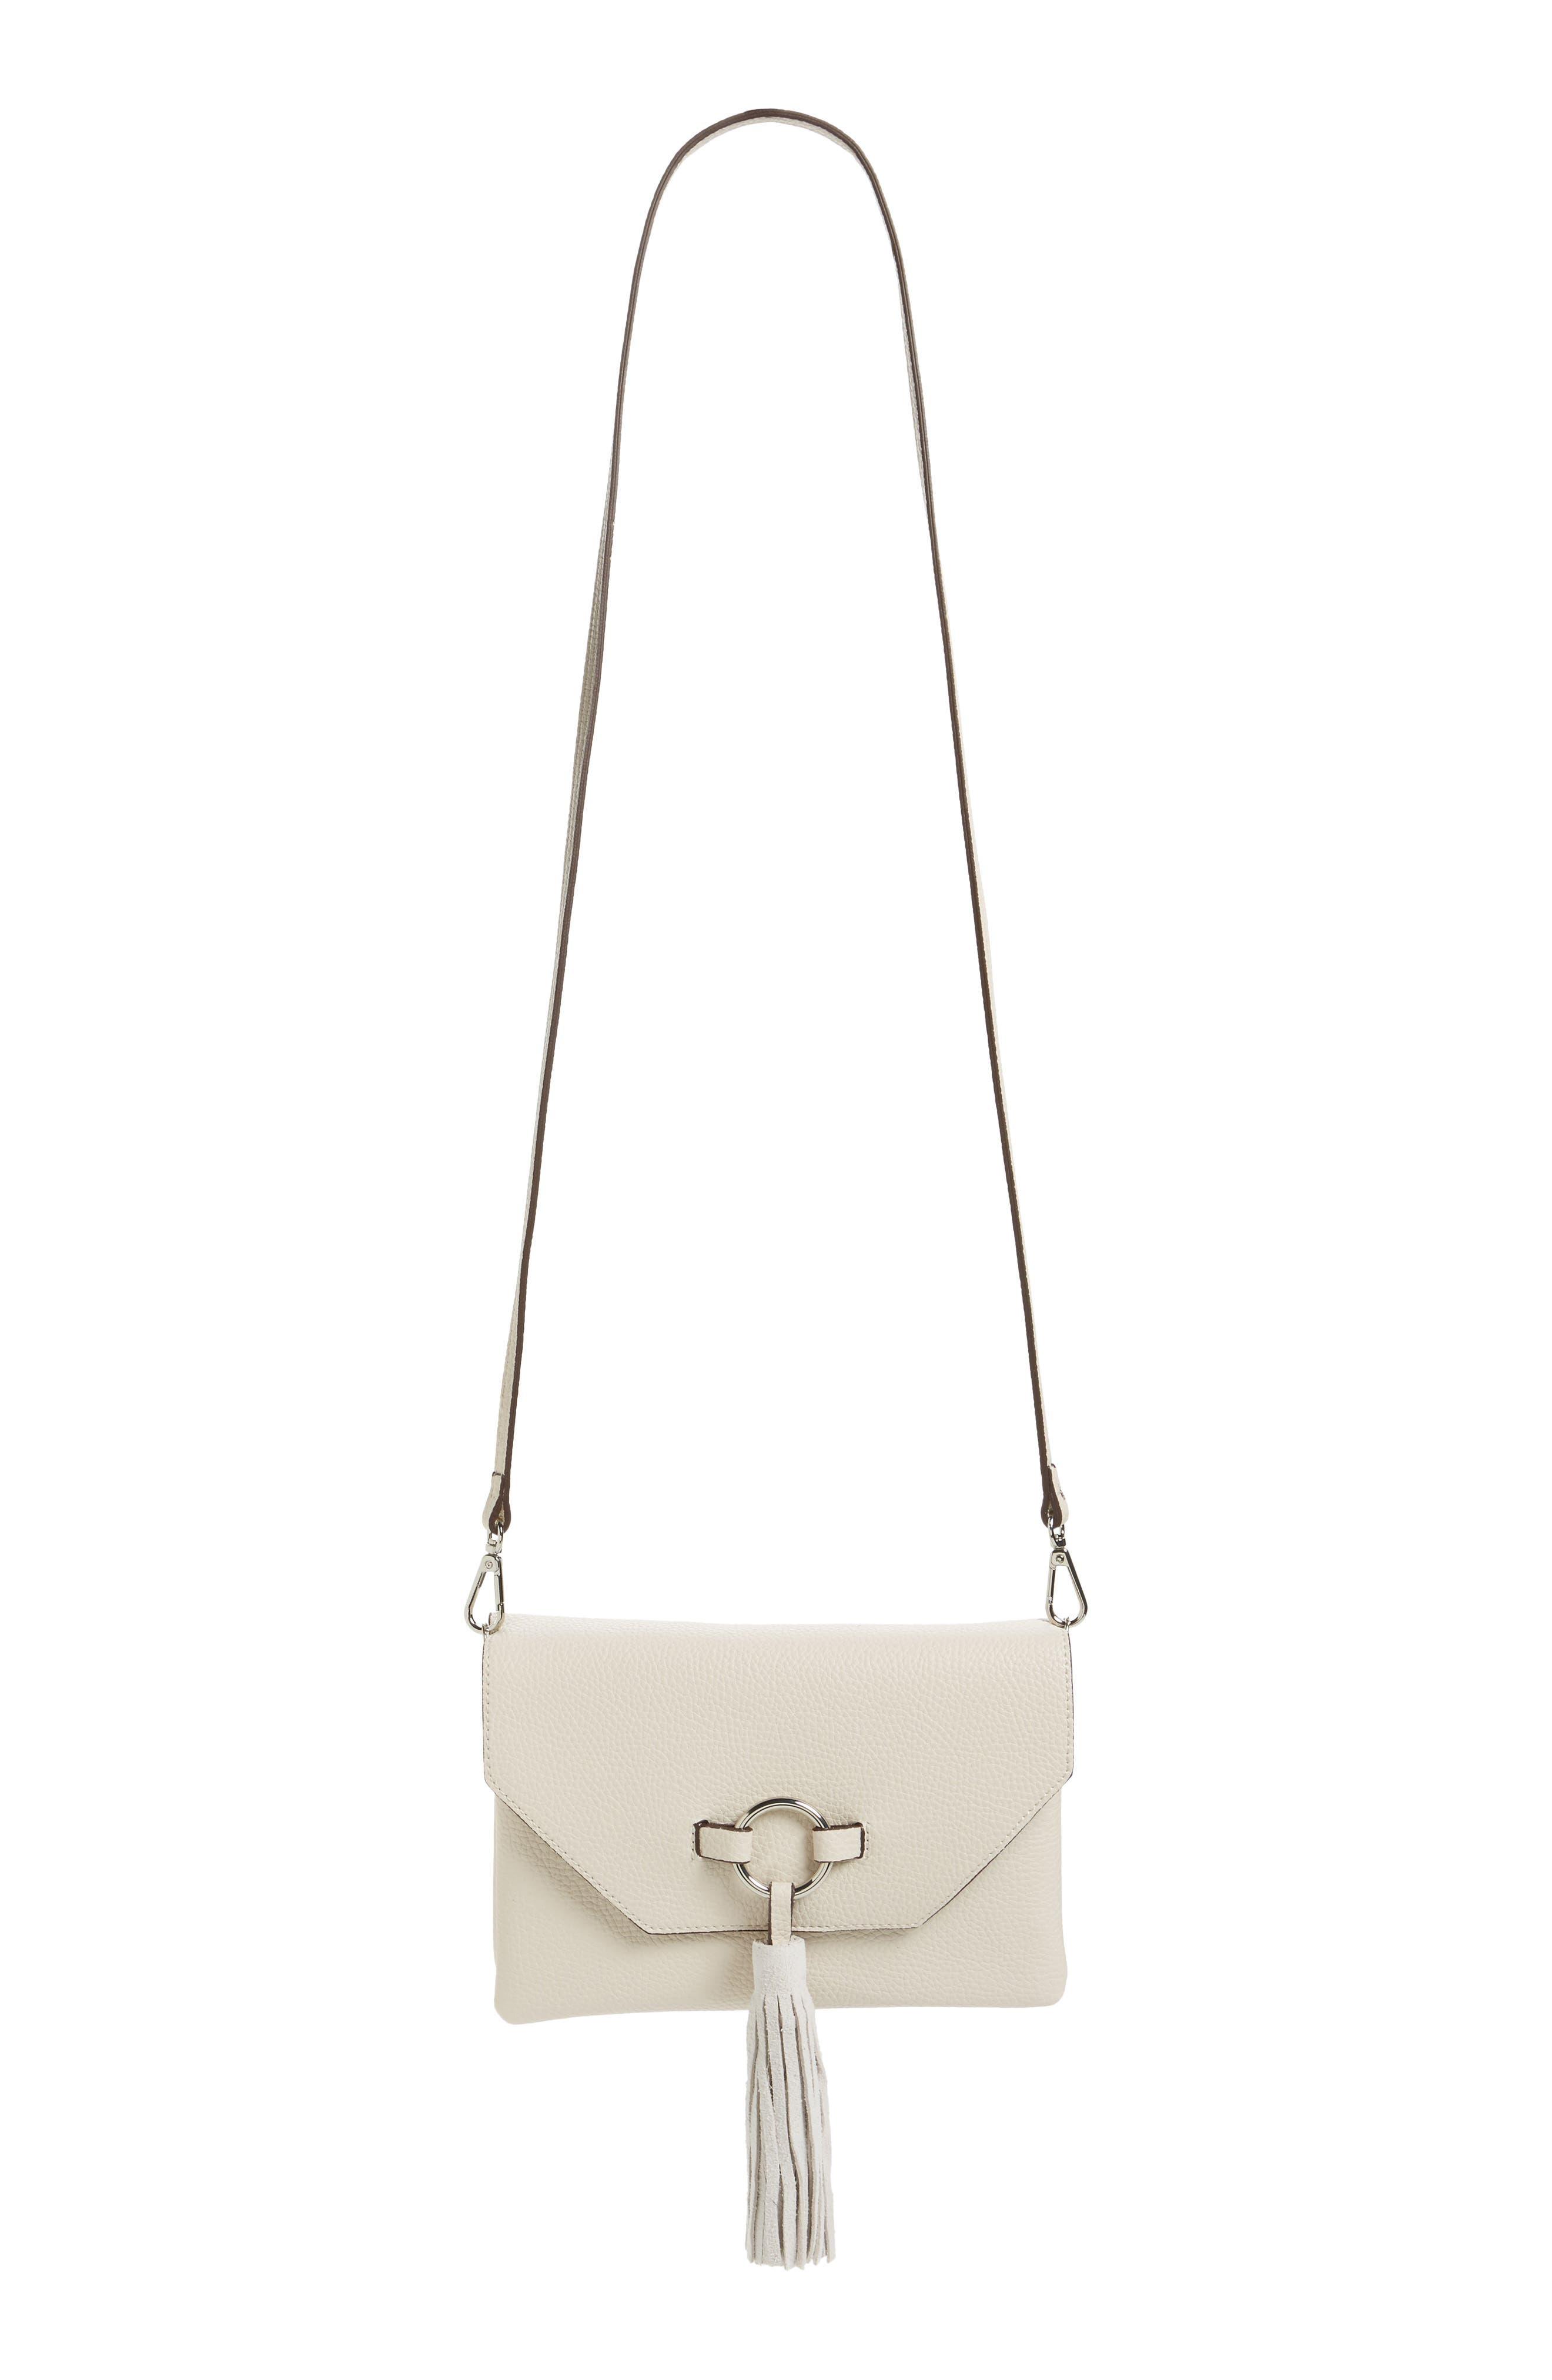 STREET LEVEL Ring Tassel Convertible Faux Leather Crossbody Bag